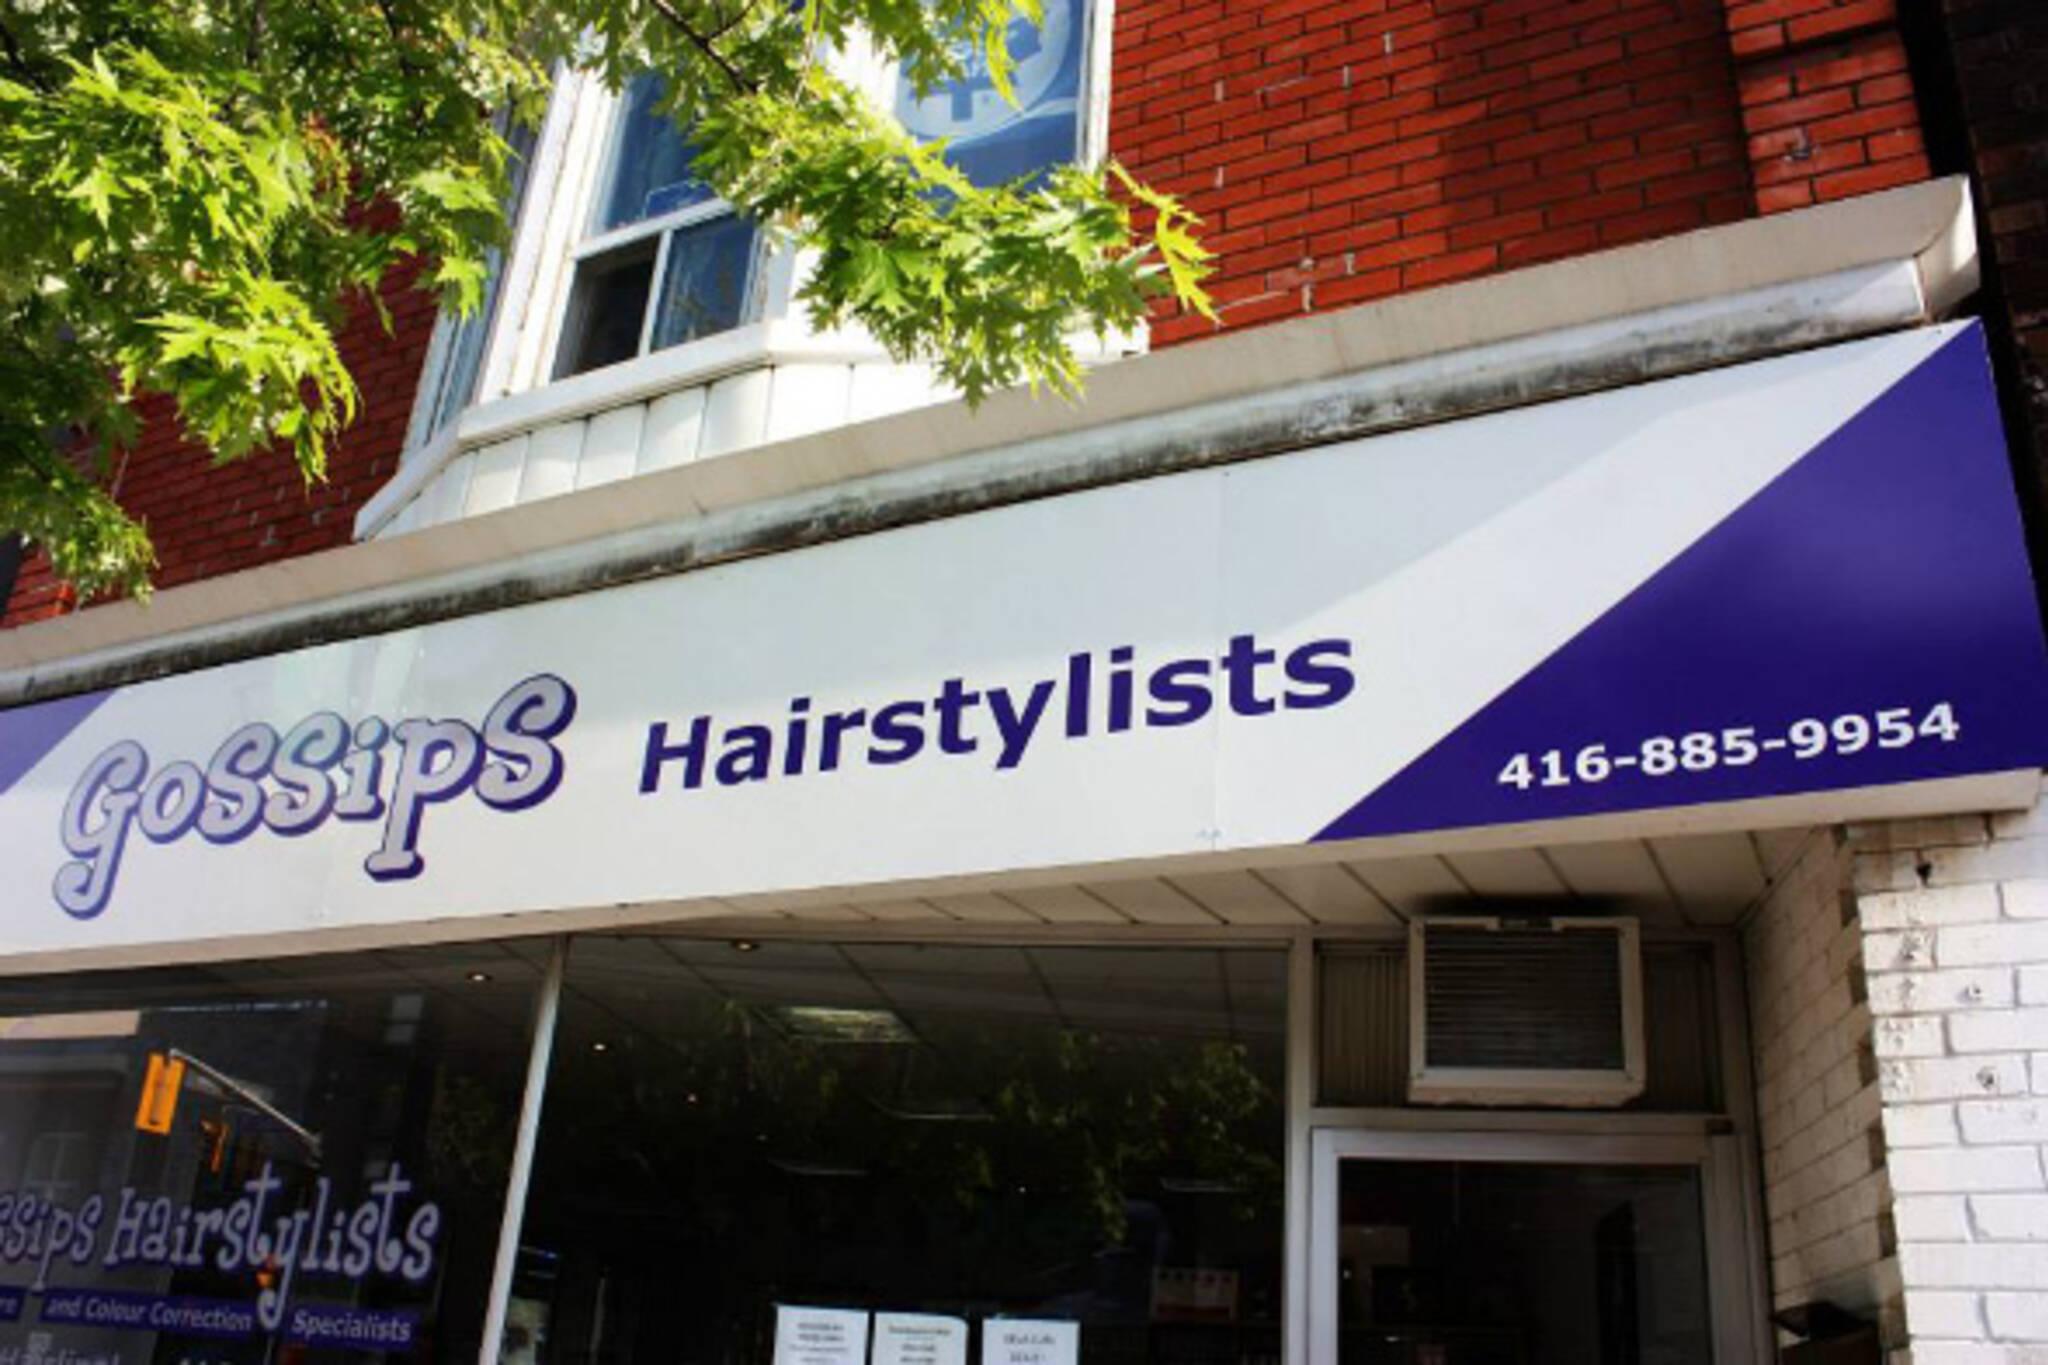 gossips hairstylists toronto